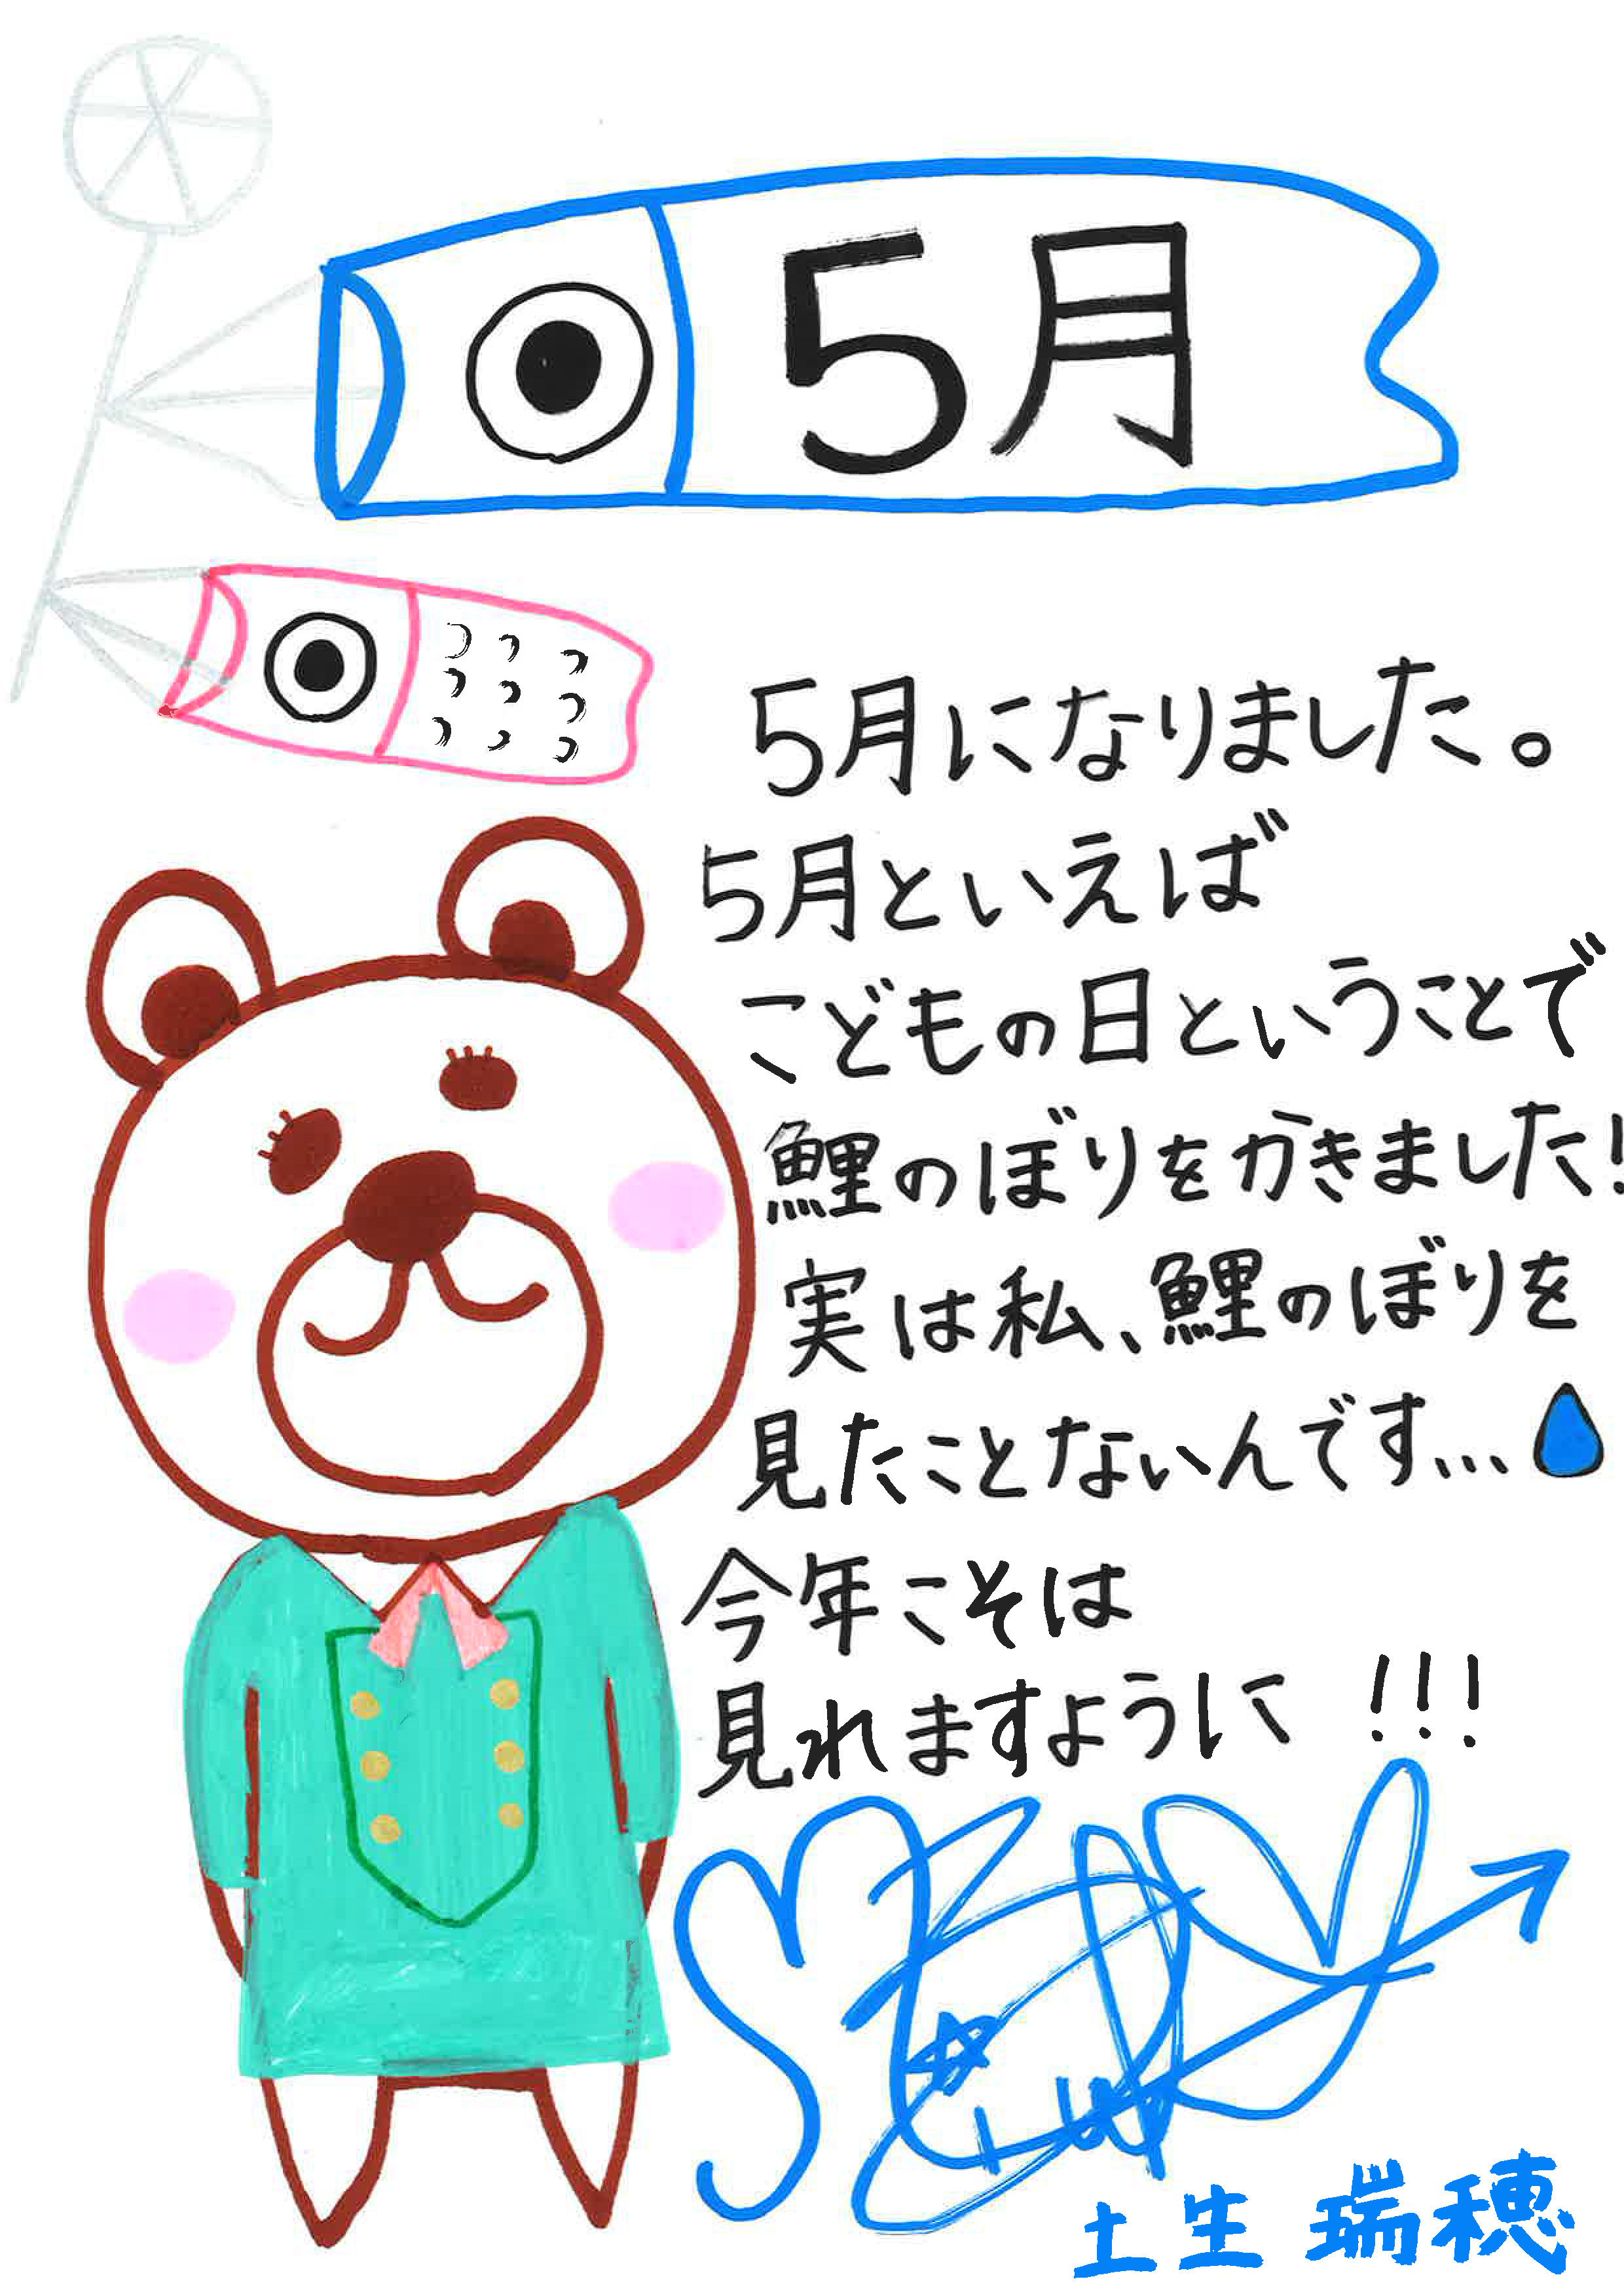 G201605_14_jpg